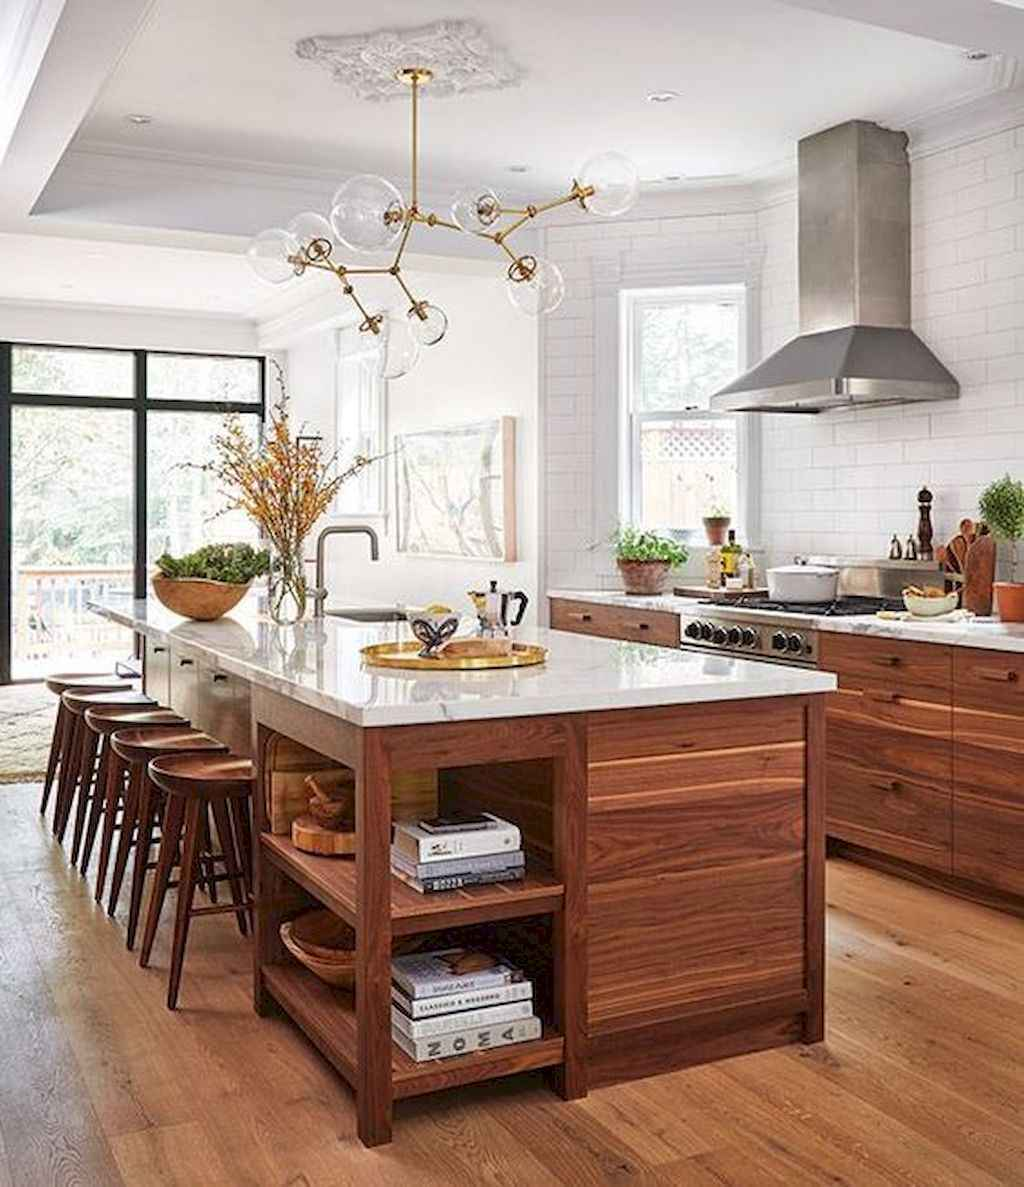 60 Inspiring Rustic Kitchen Decorating Ideas (55)